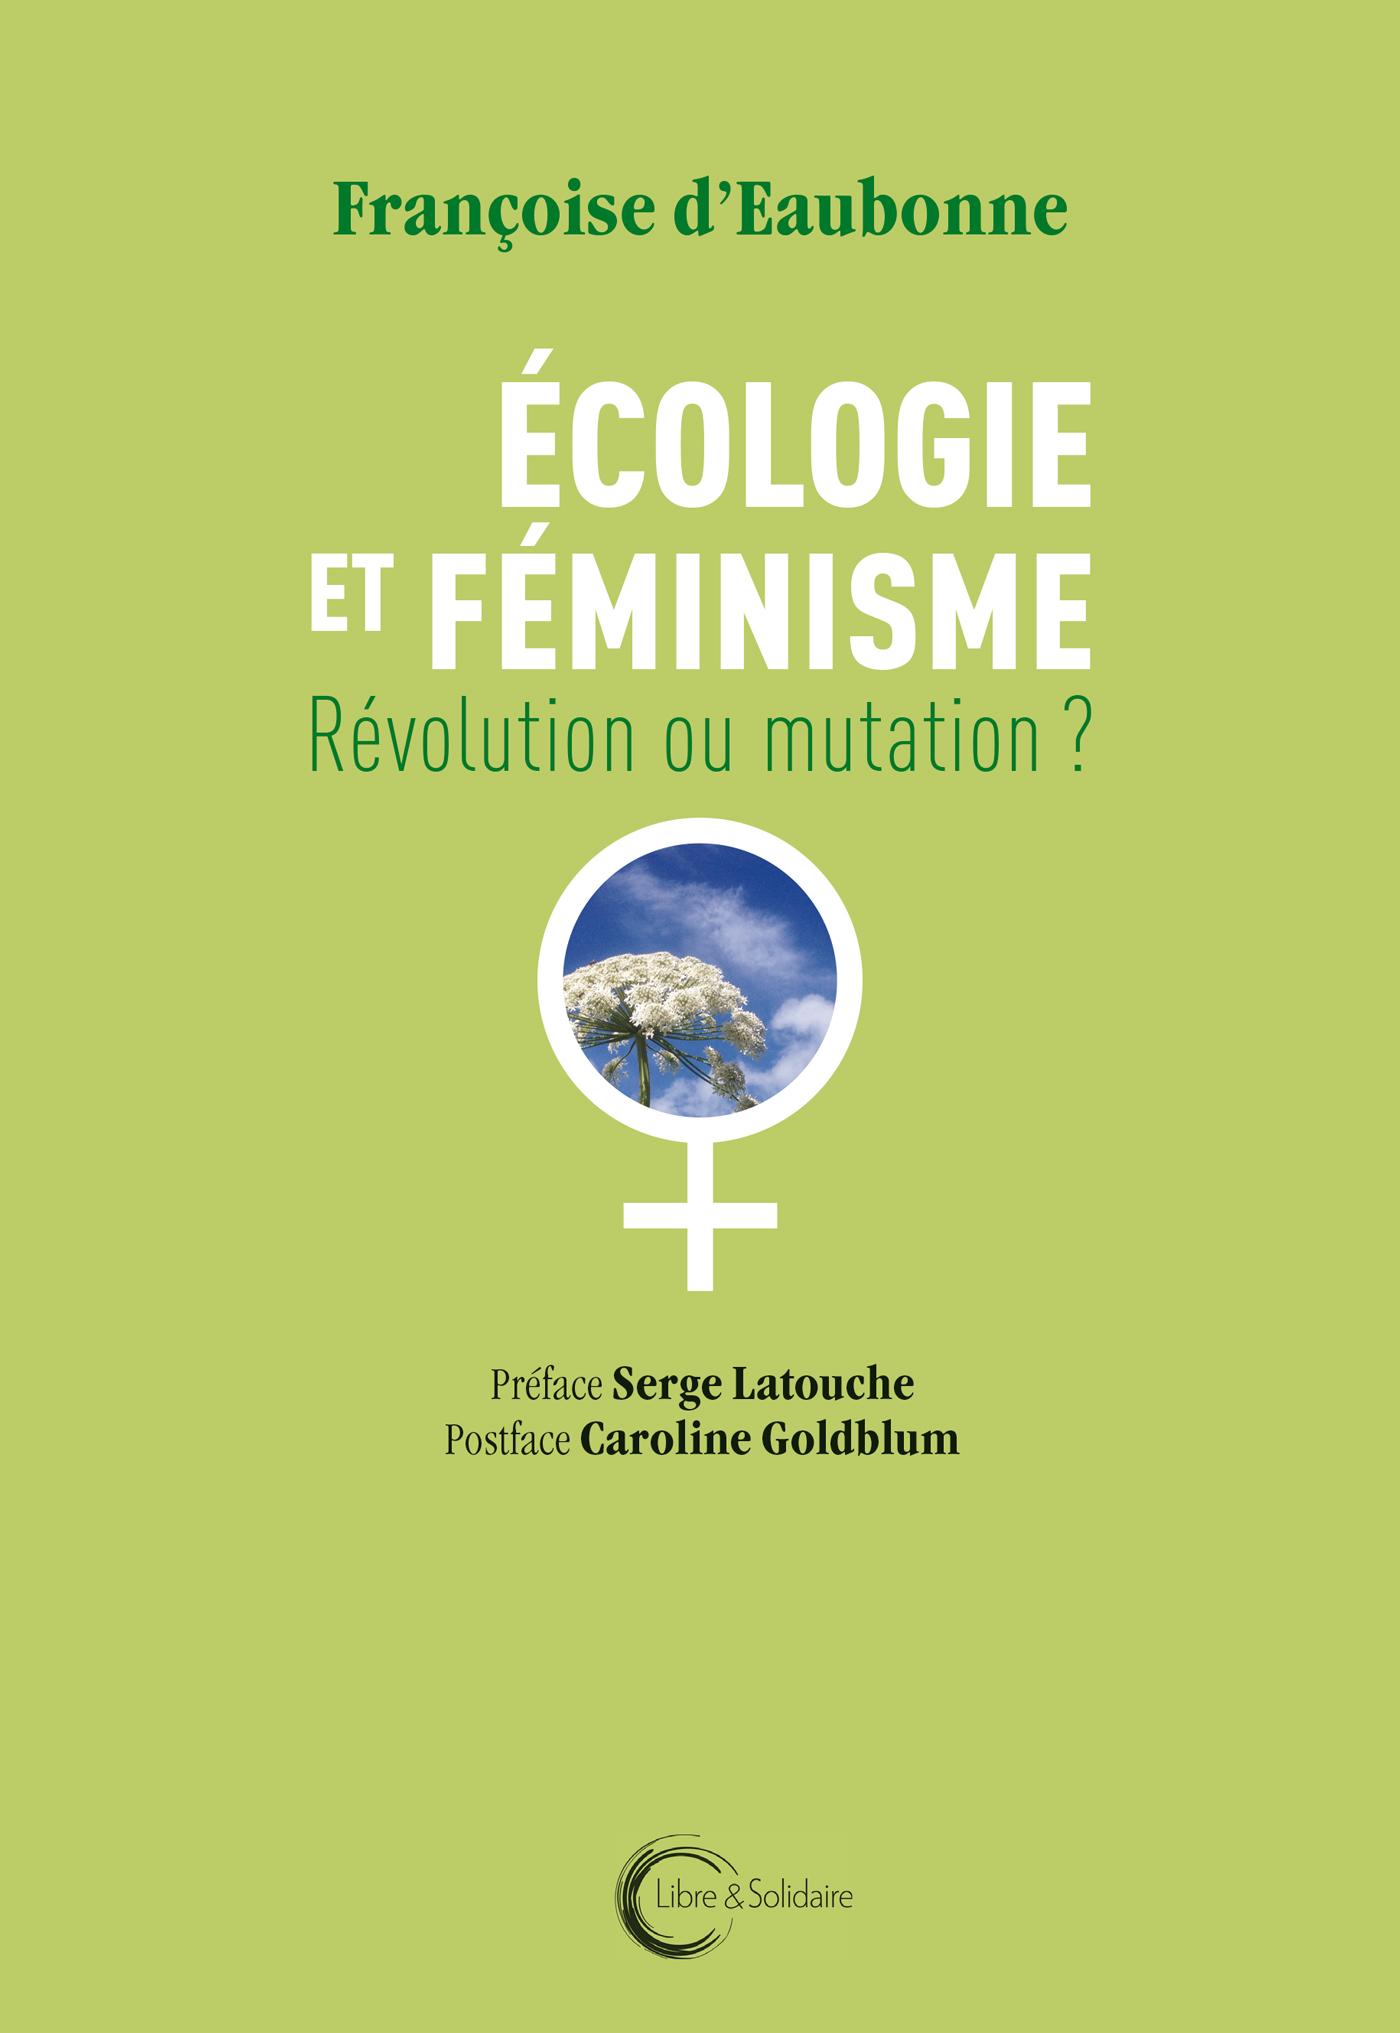 ECOLOGIE ET FEMINISME - REVOLUTION OU MUTATION ?